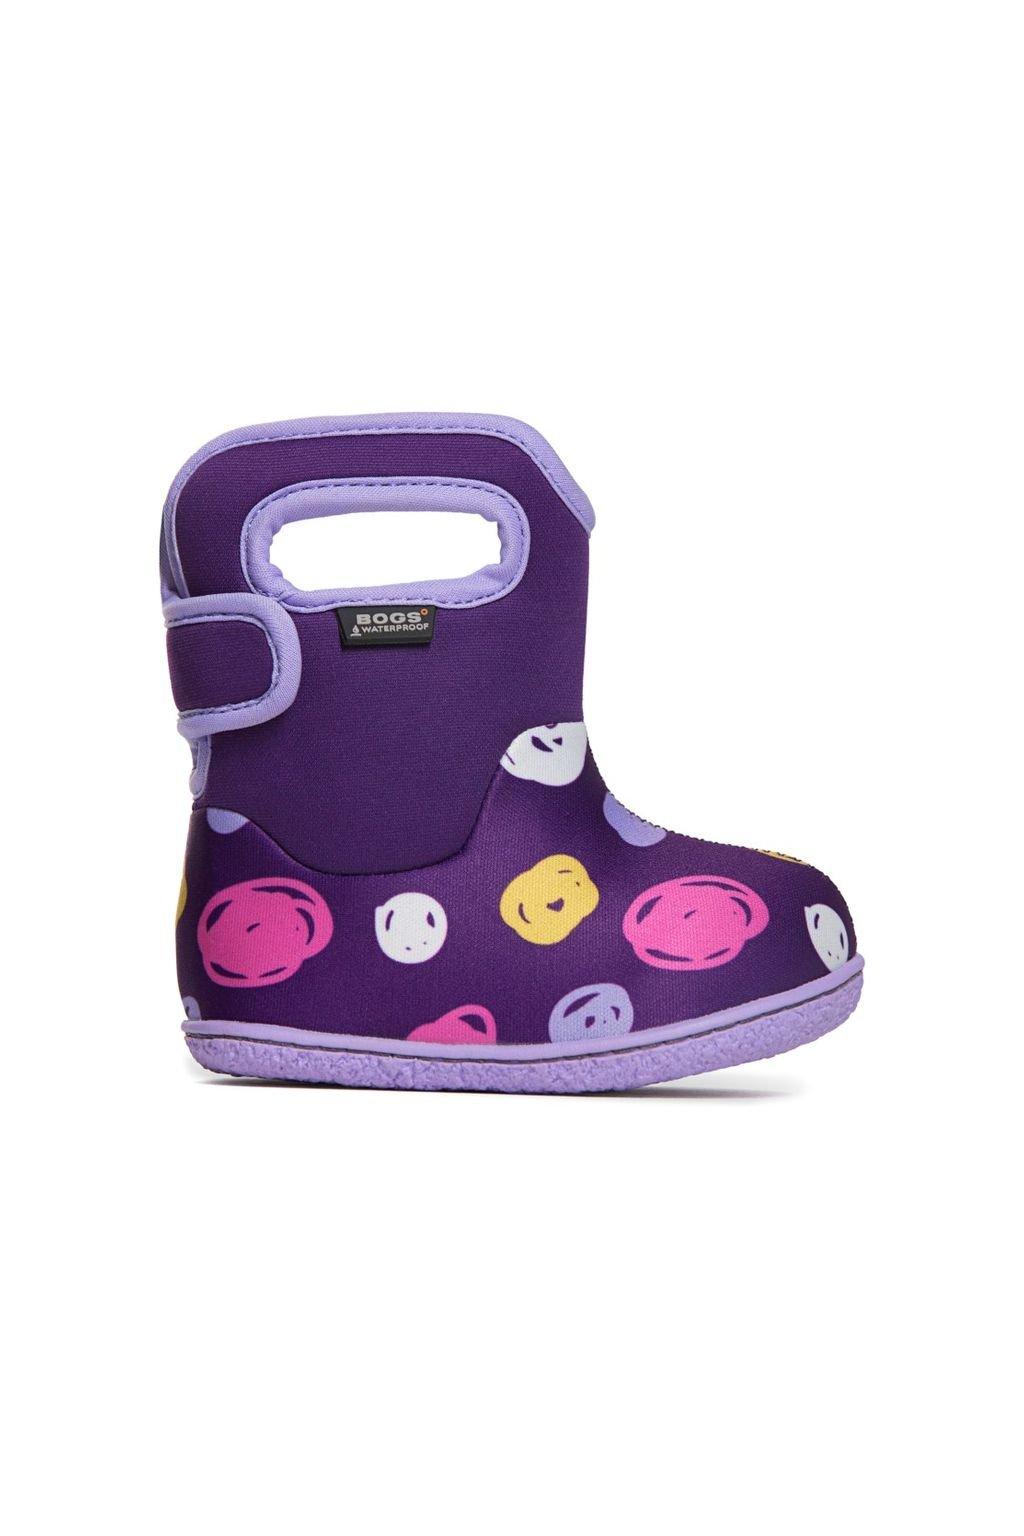 Bogs Classic Dots Purple